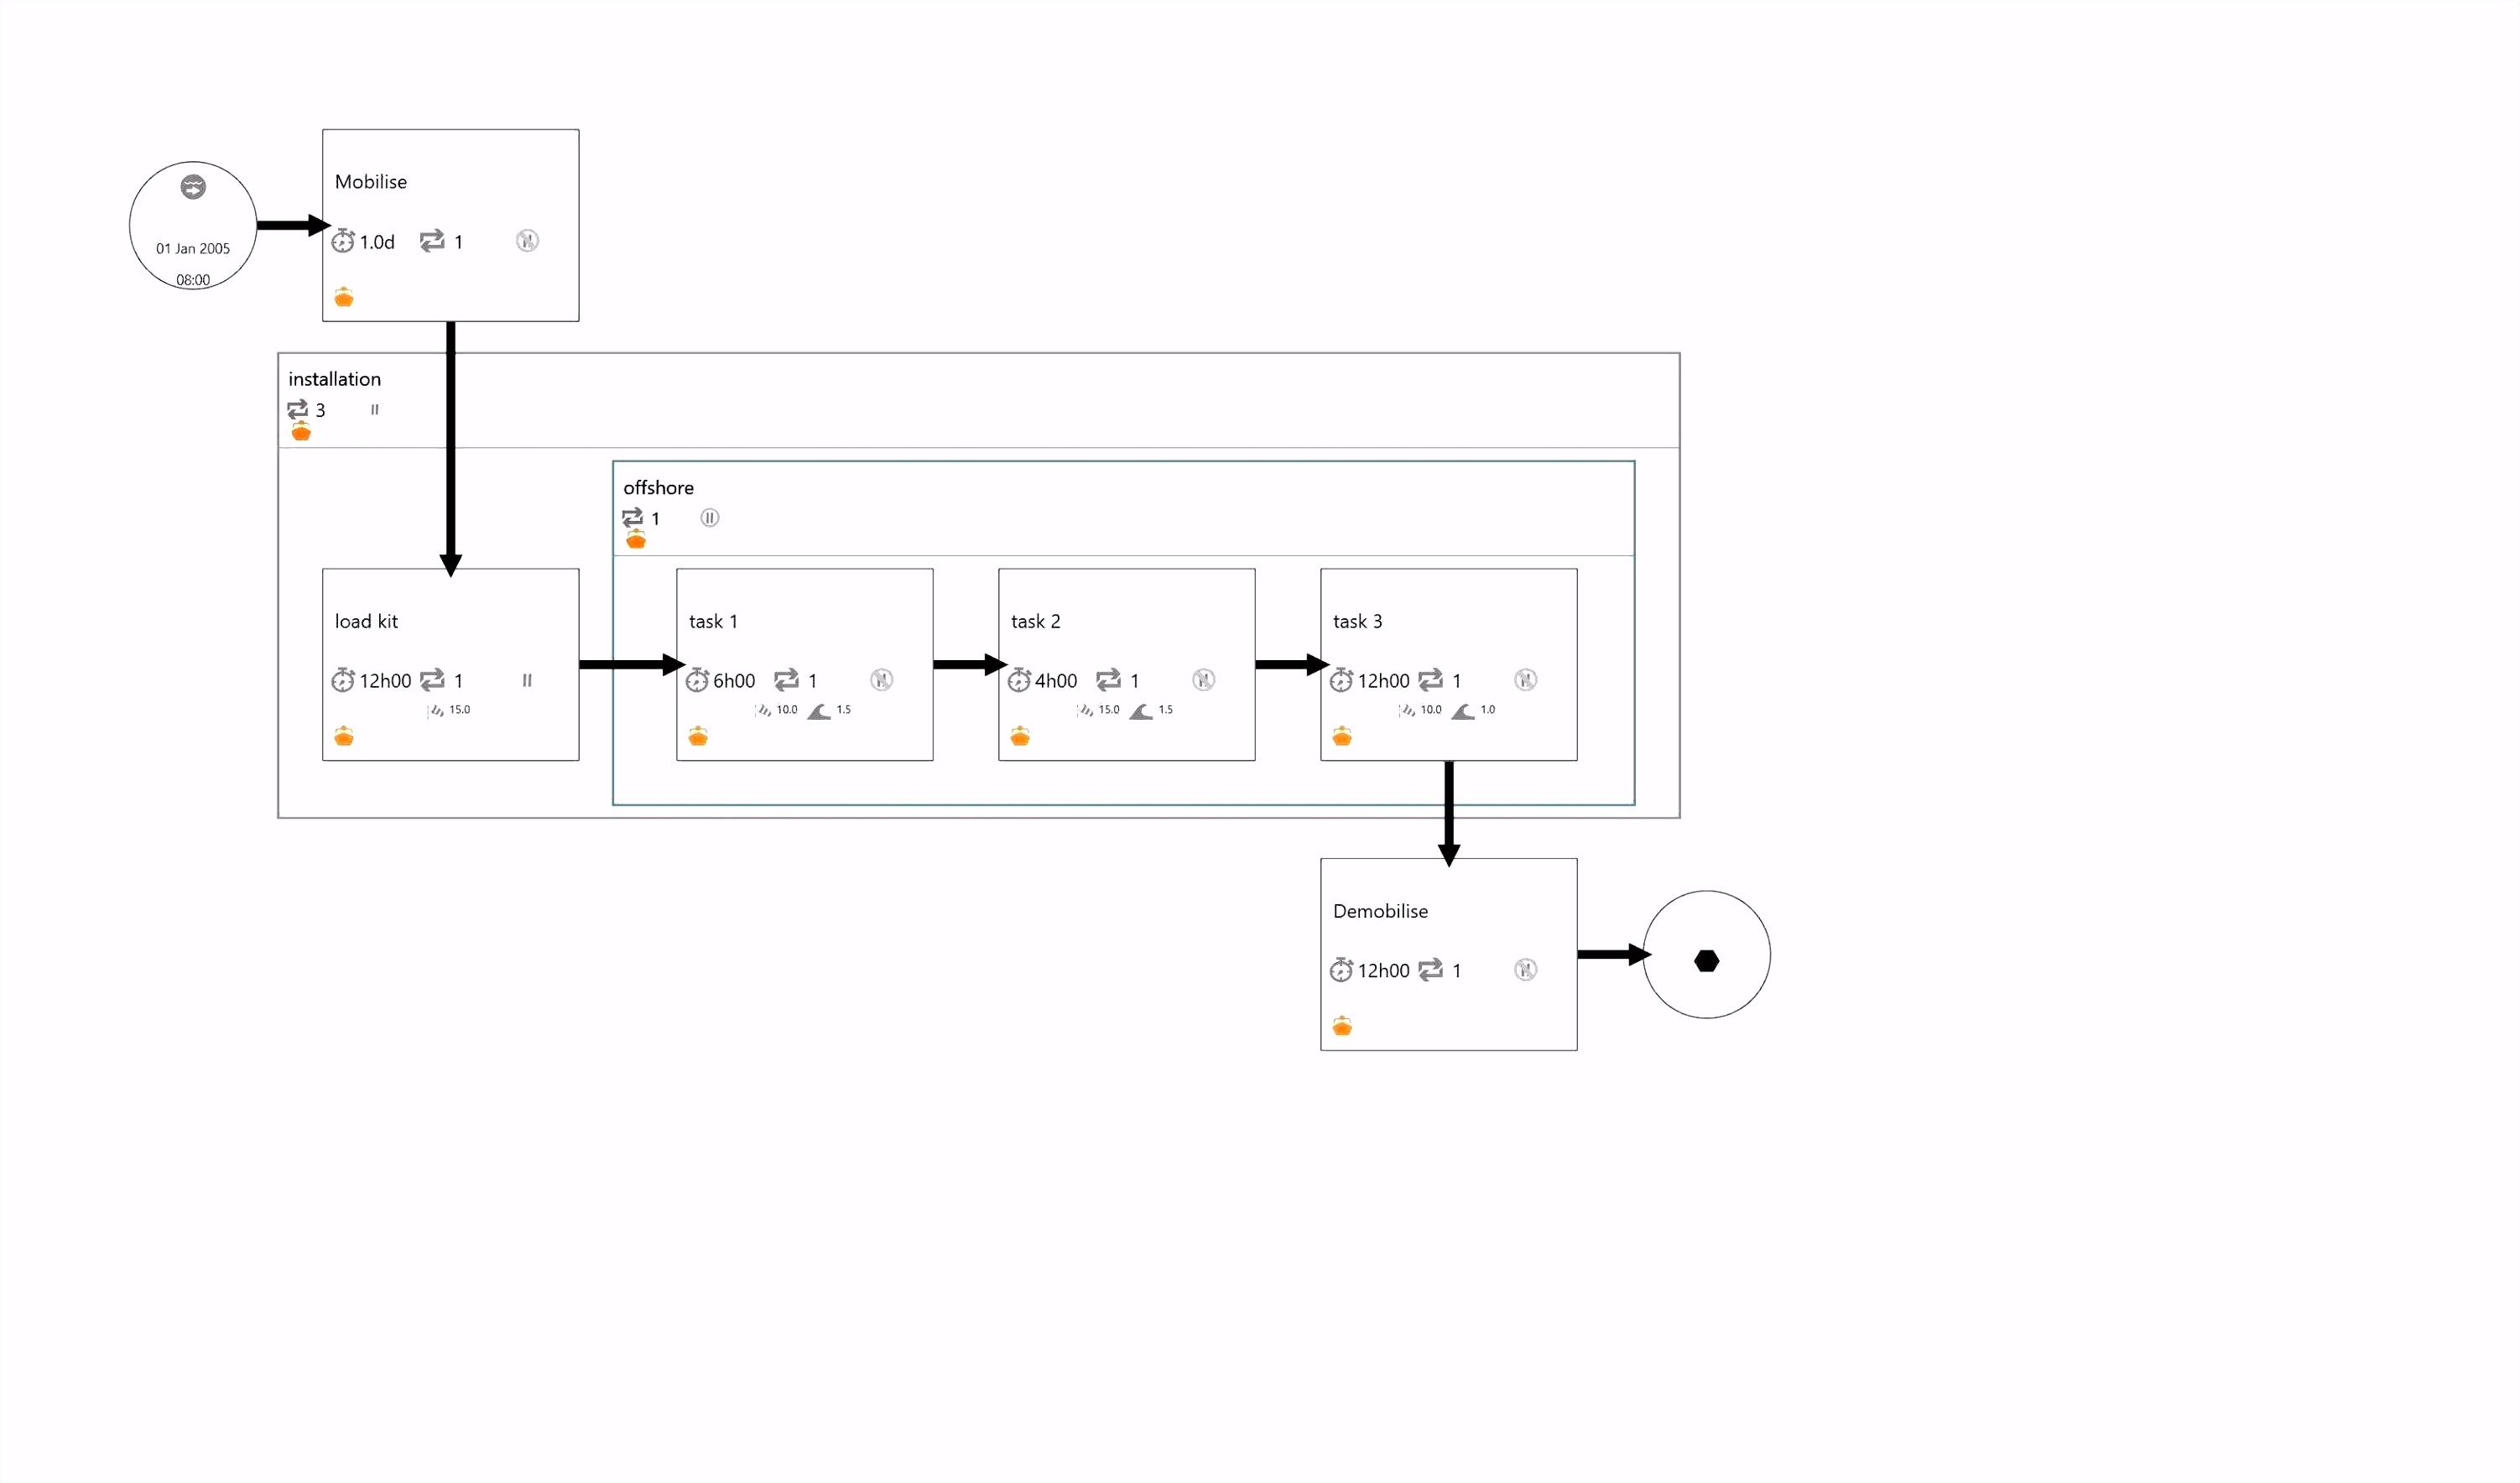 Powerpoint Vorlagen Microsoft Microsoft Excel Dashboard Template – Ghabon J4jg34xke3 Zsuj55hpnh